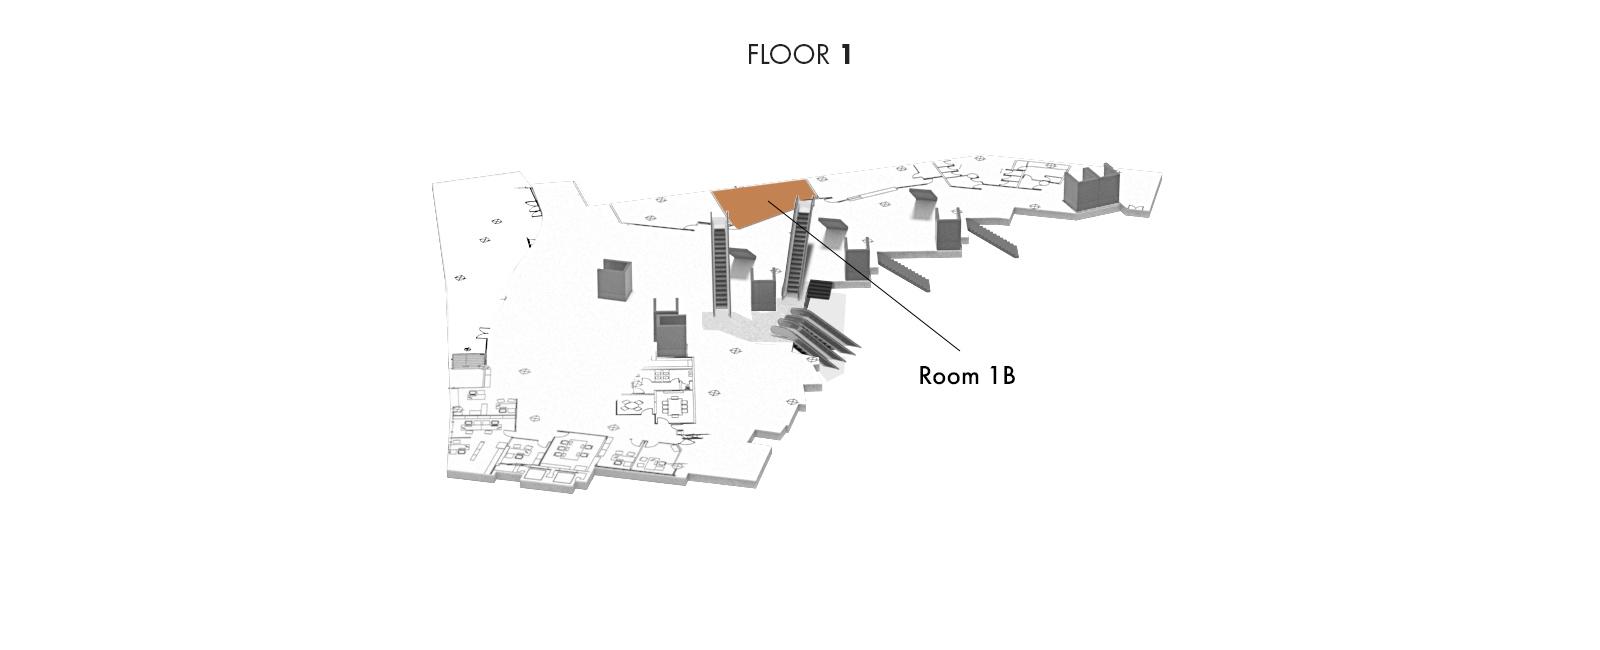 Room 1B, Floor 1   Palacio Euskalduna Jauregia